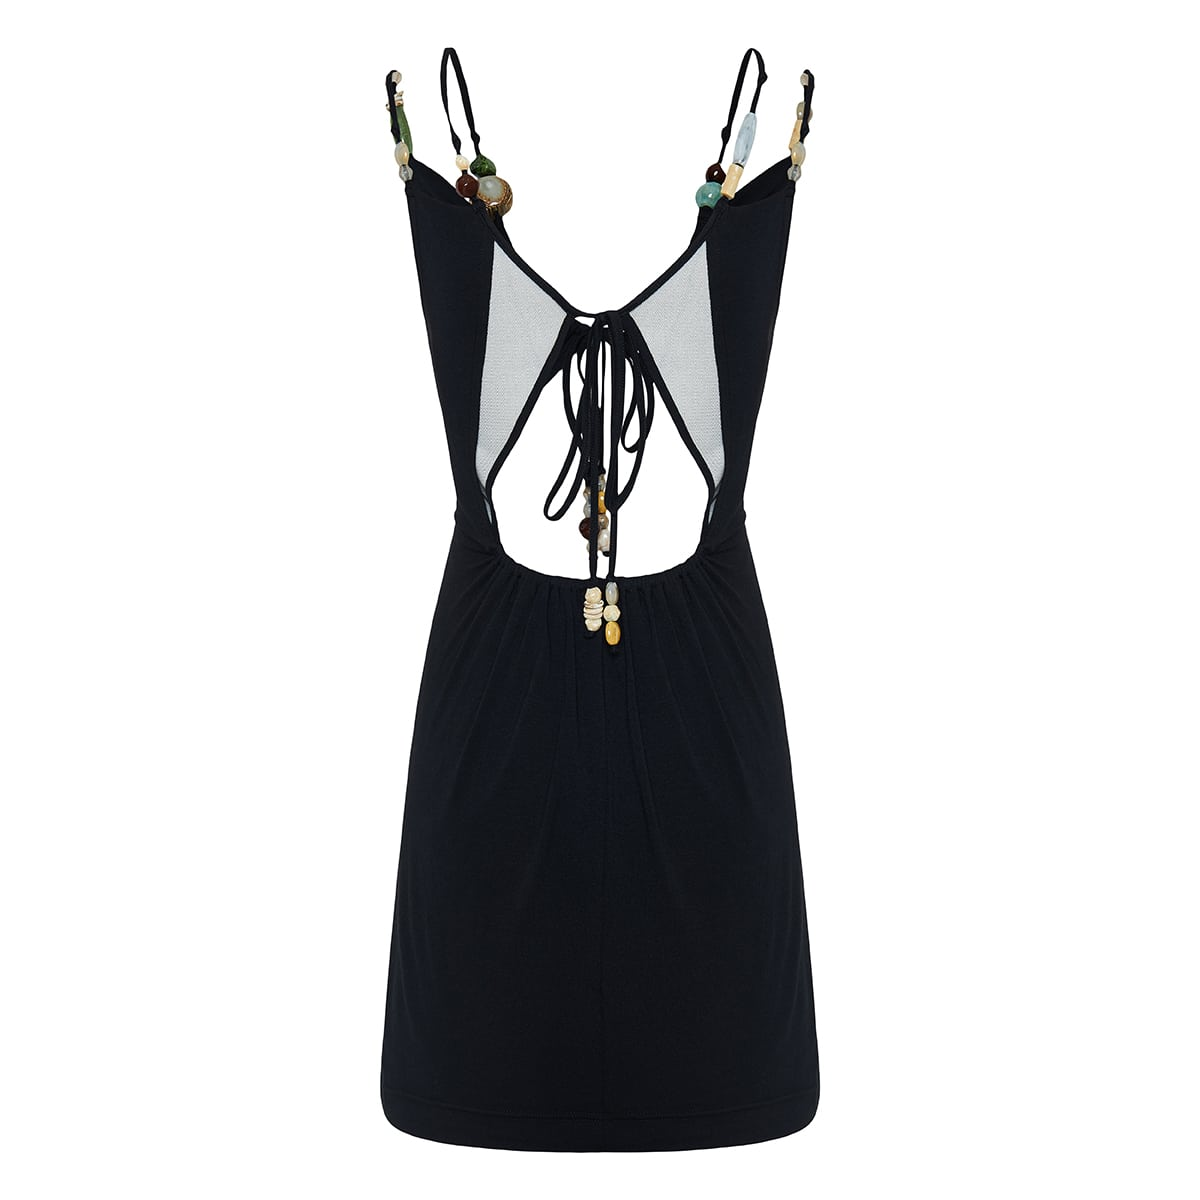 Bead-embellished cutout mini dress